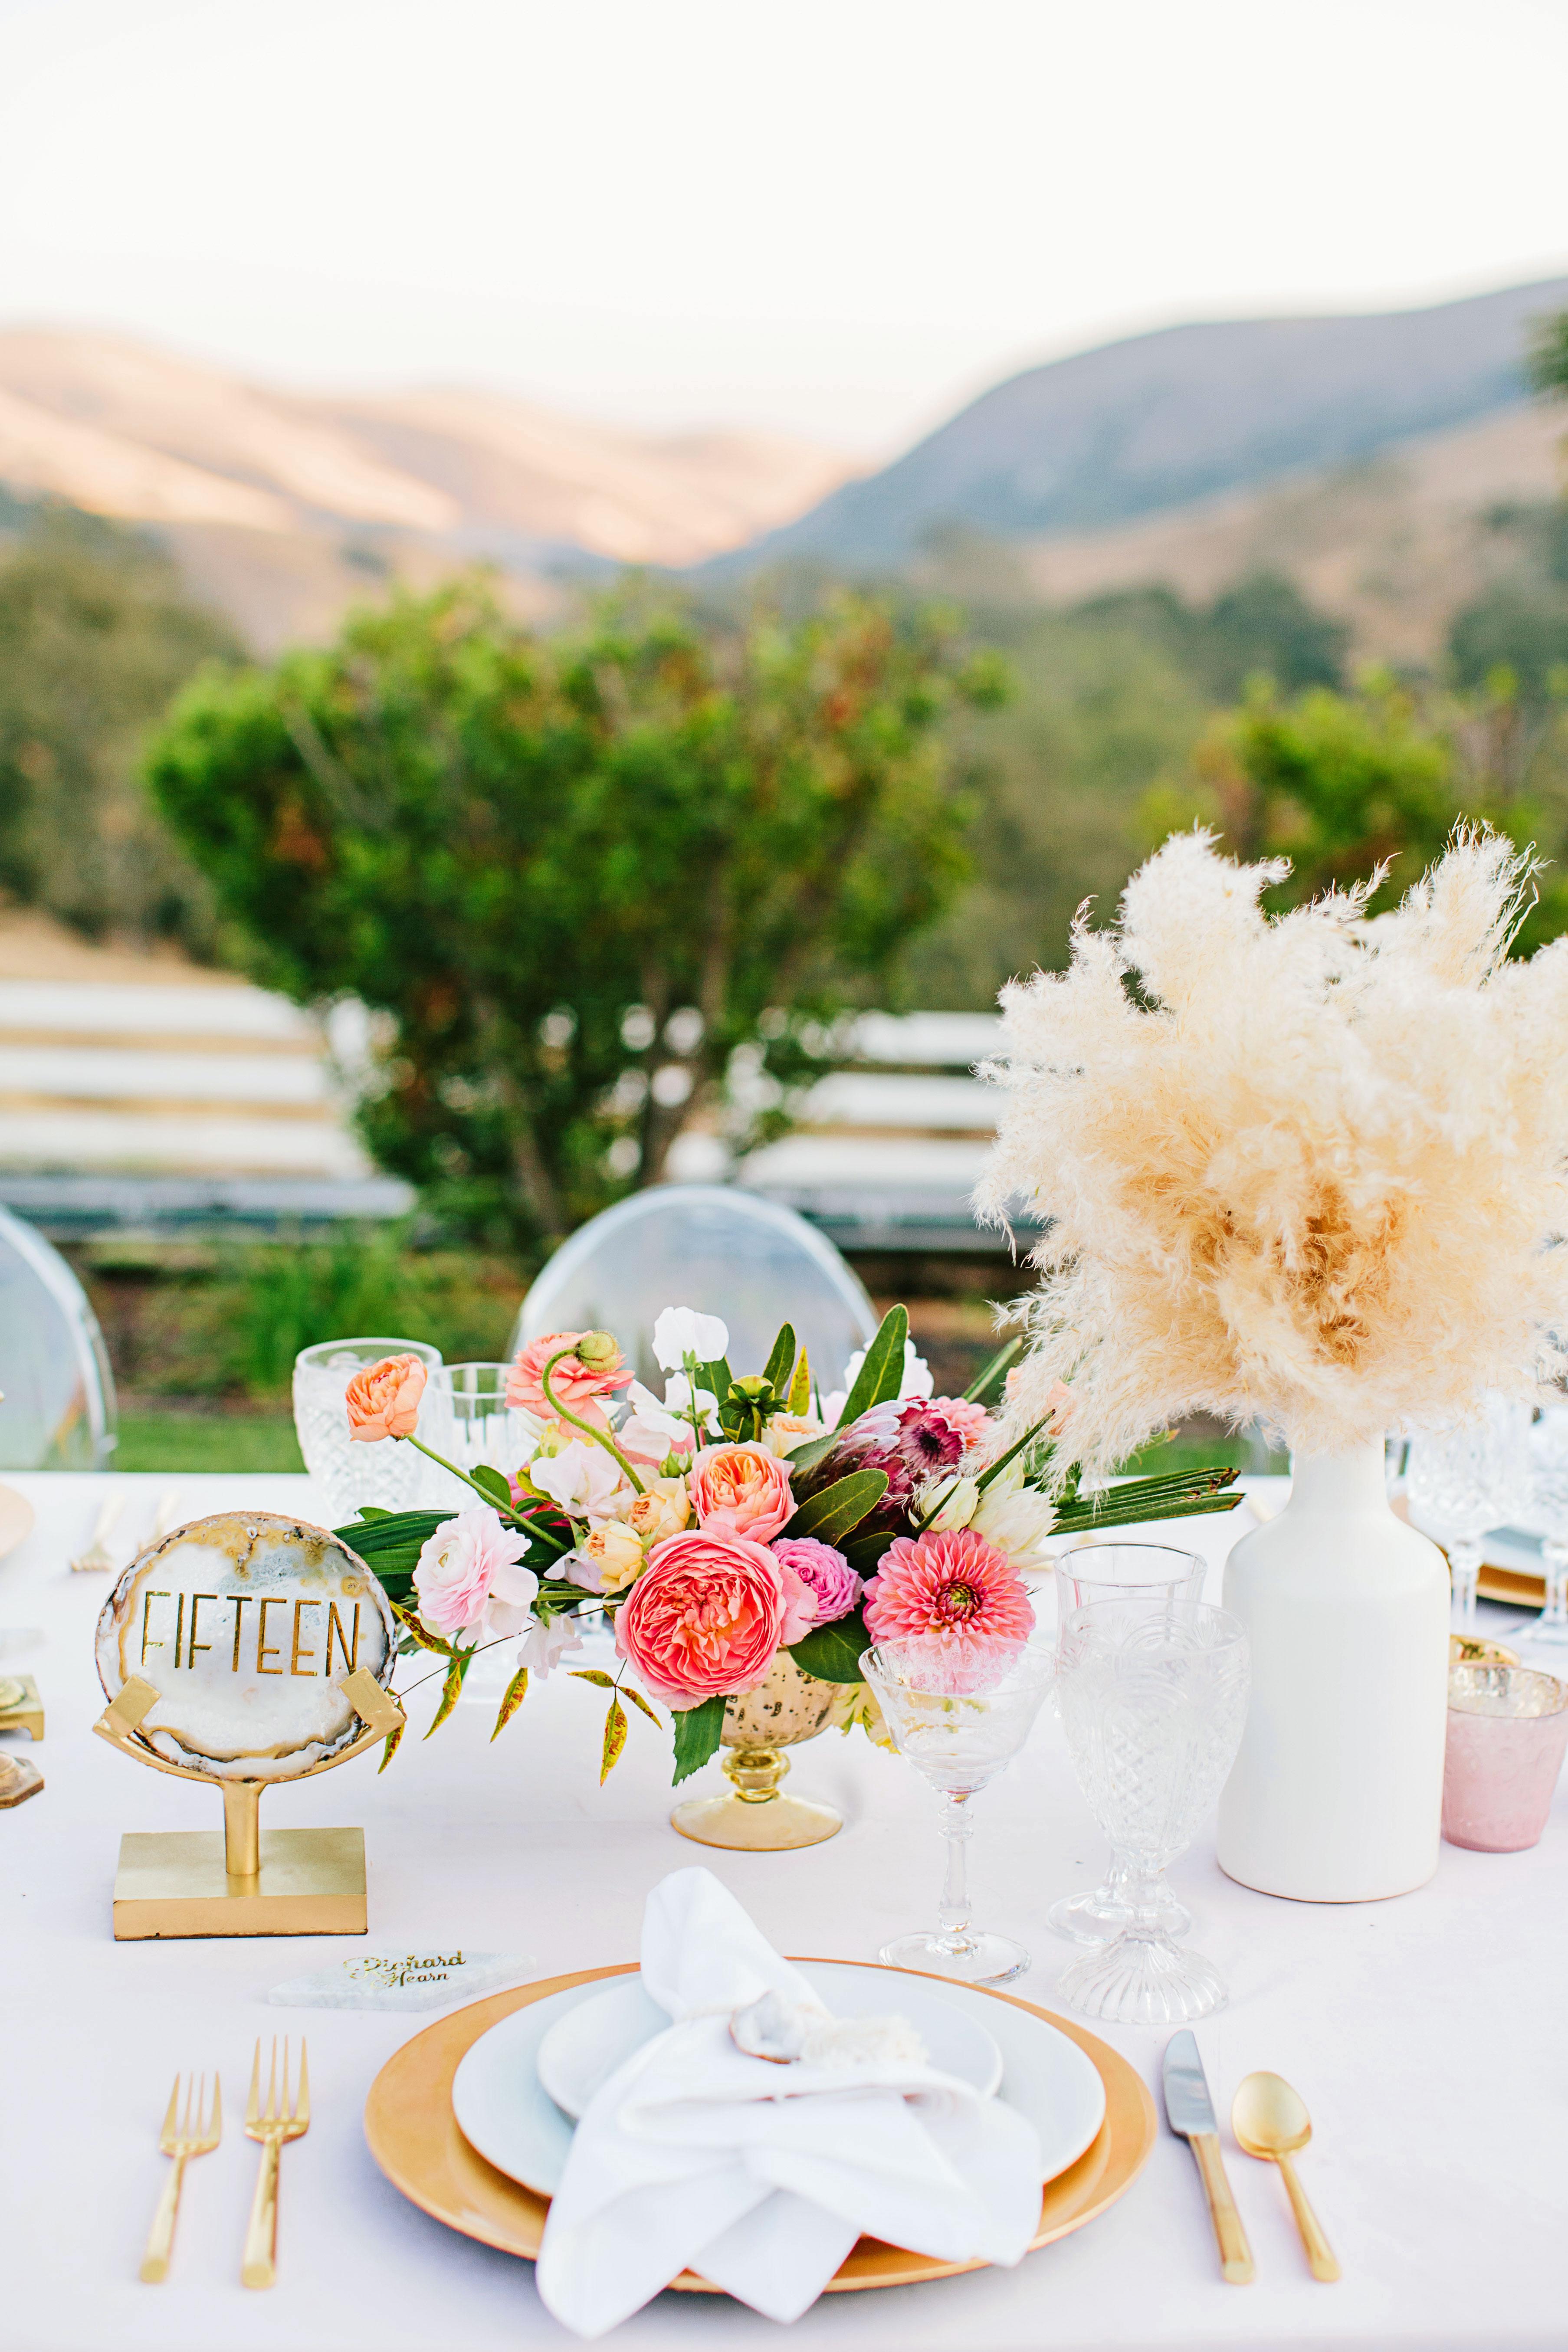 stephanie jared wedding place setting